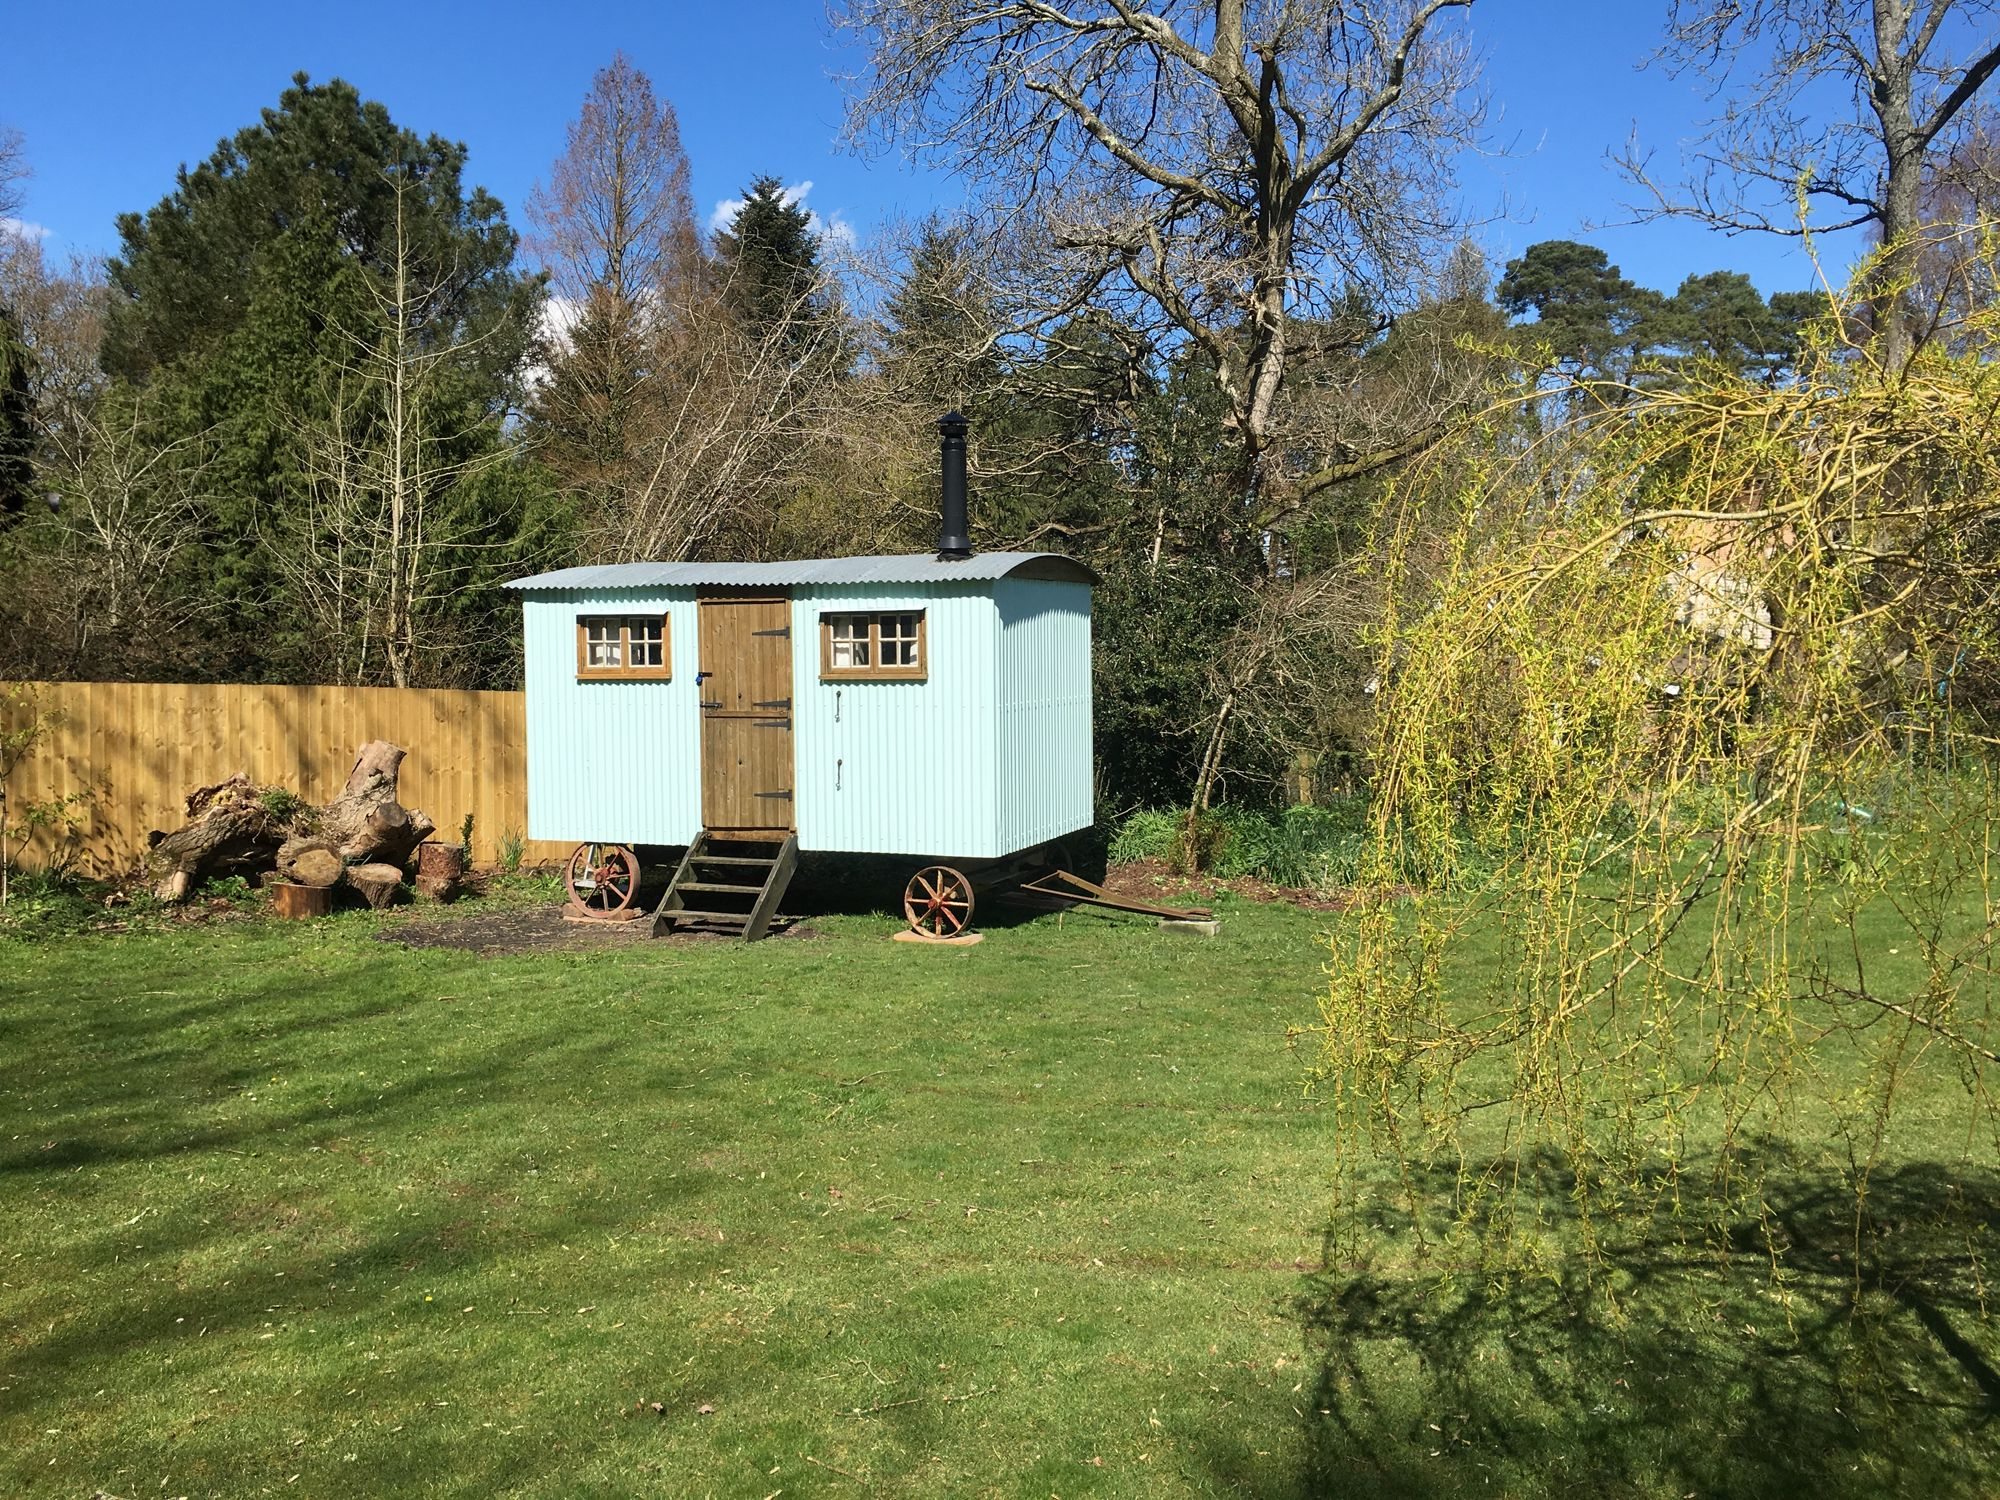 Fernwood Shepherd's Hut